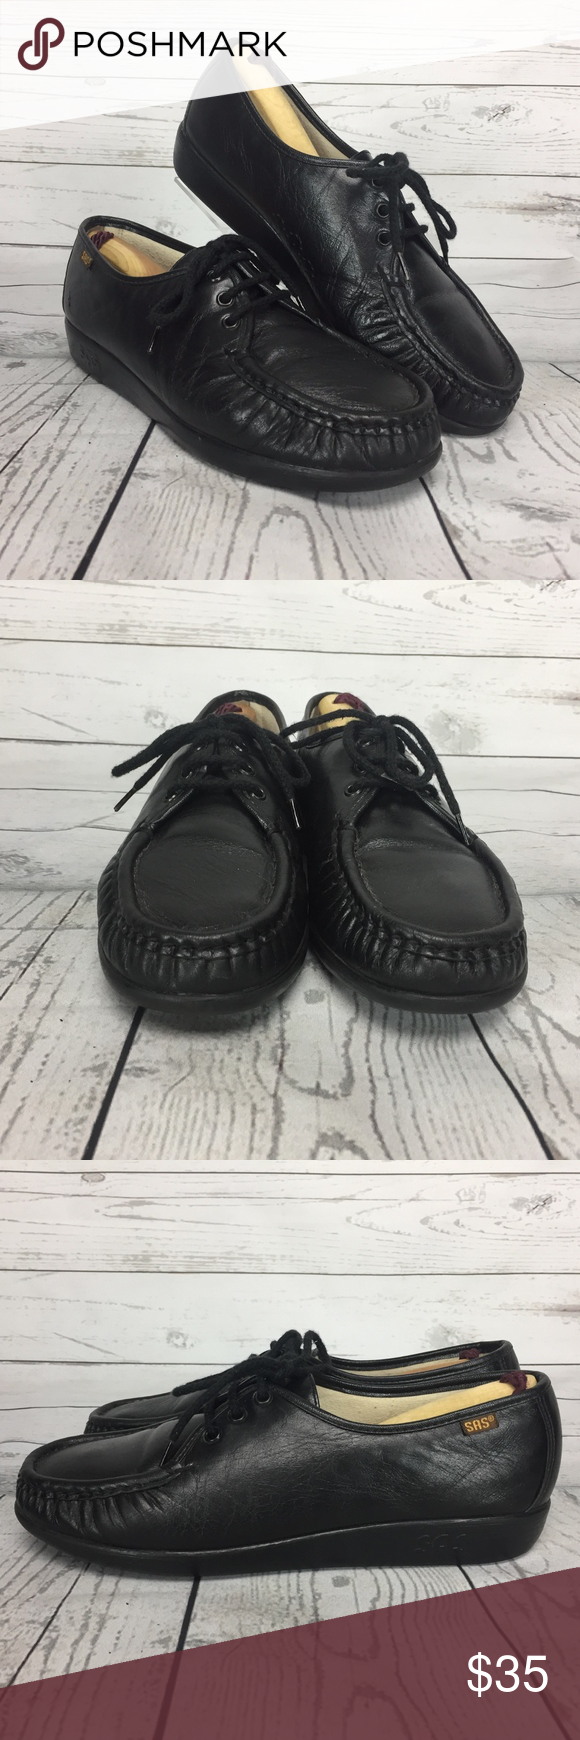 e74e2bbf34d7 SAS Siesta Lace Up Comfort Shoe 9.5 Hand Sewn Toe SAS Women s Siesta Lace  Up Comfort